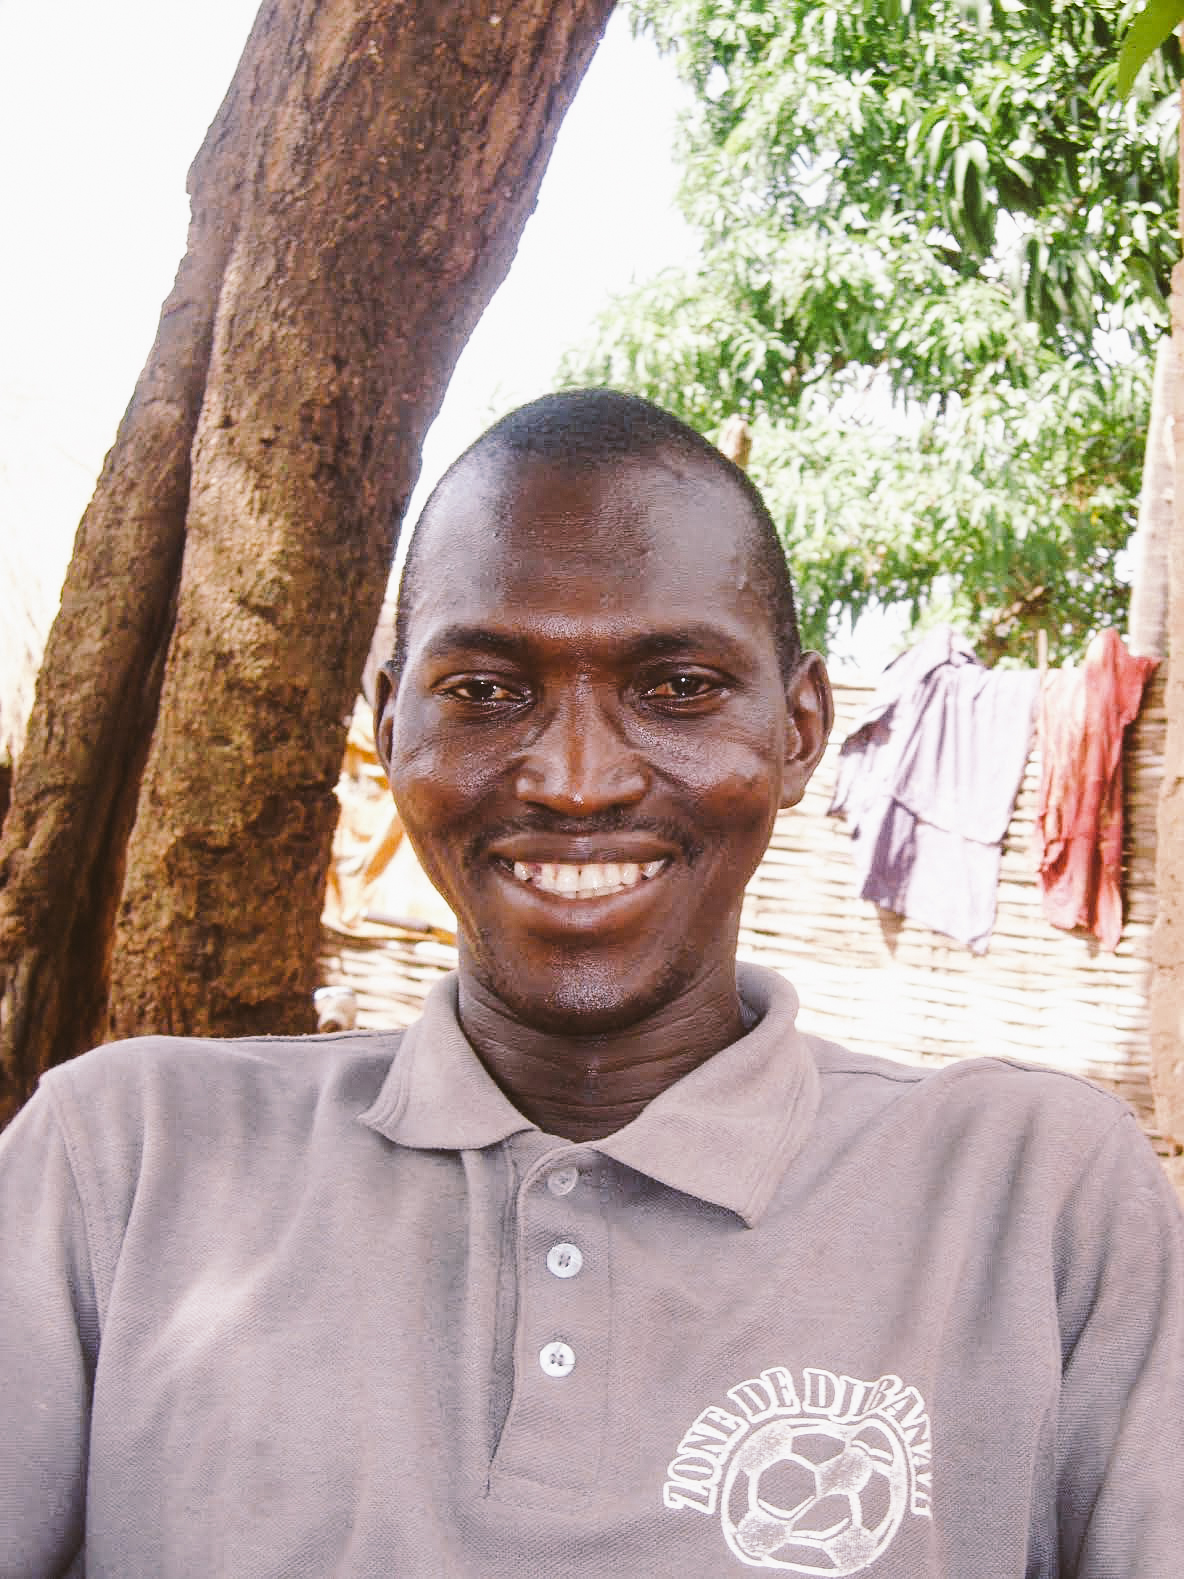 Mamadou Gassama - Farmer along SFL Road #10, Djibanar to Bafata